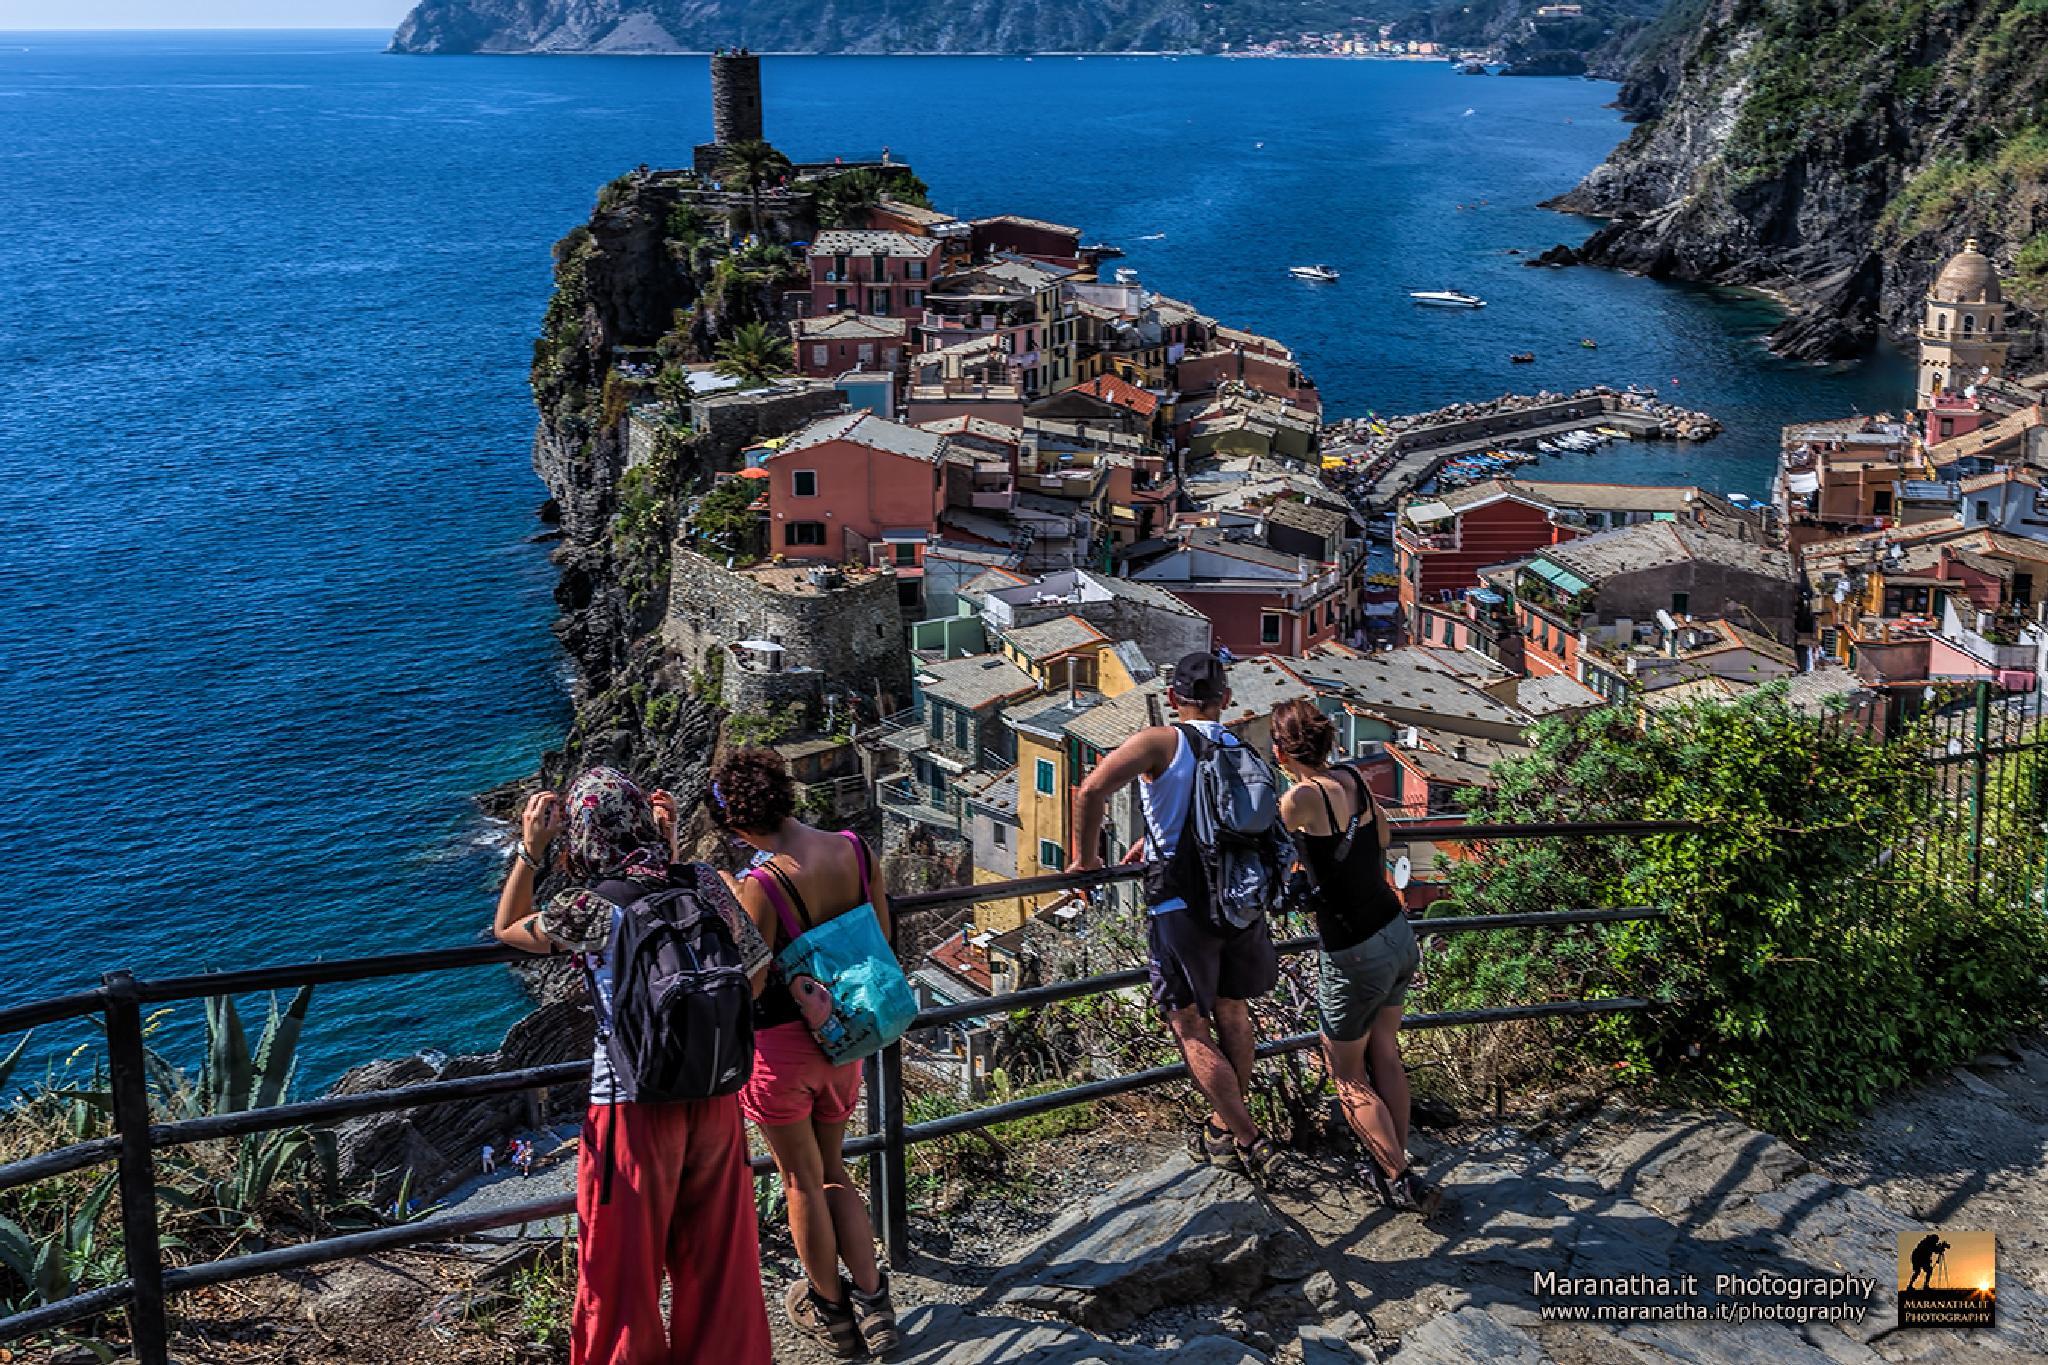 Vernazza, Cinque Terre, Liguria by Maranatha.it Photography